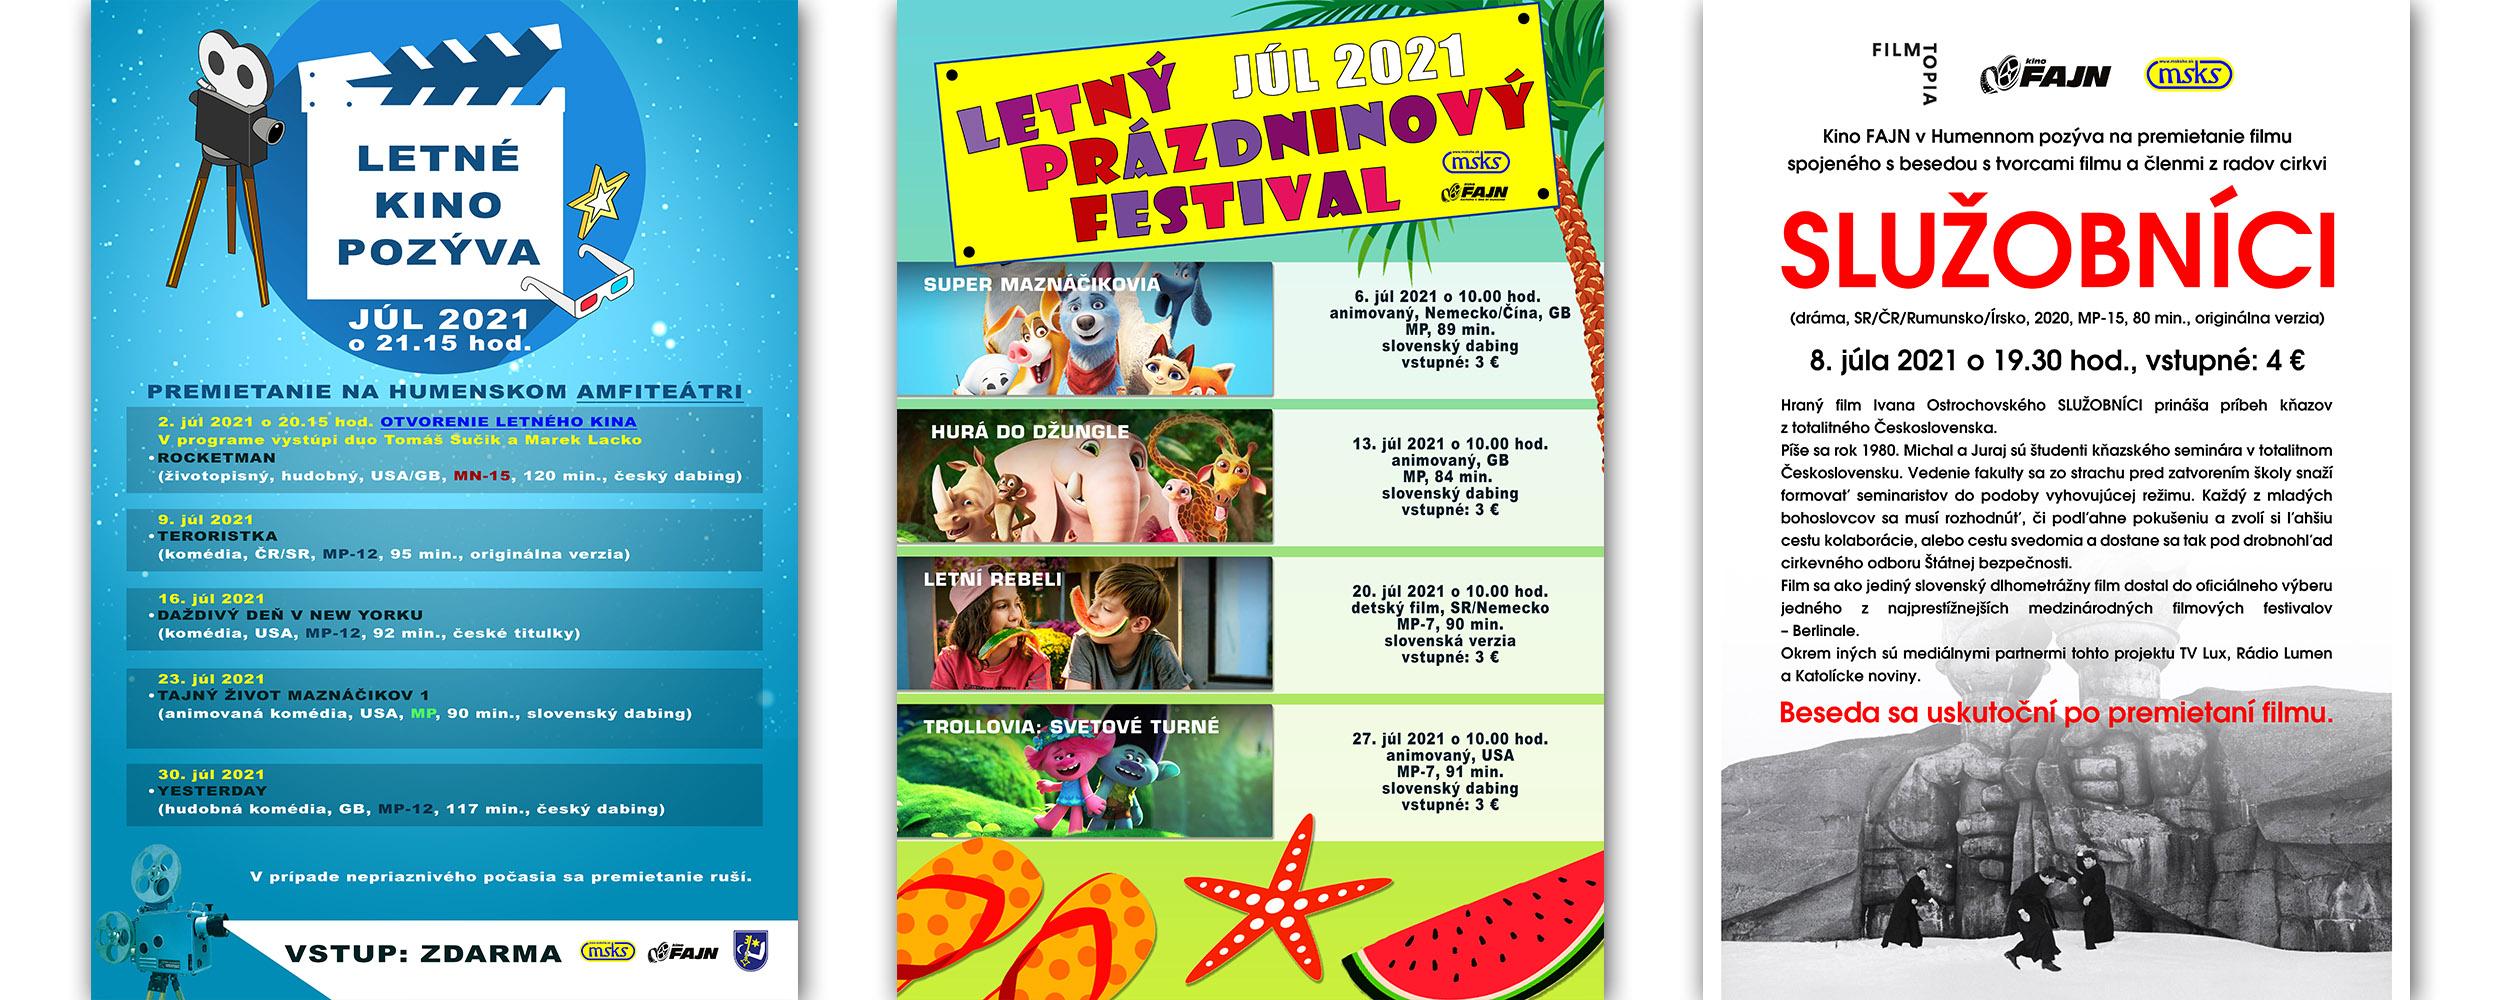 Letné Kino Prazdn Festival Služobnici